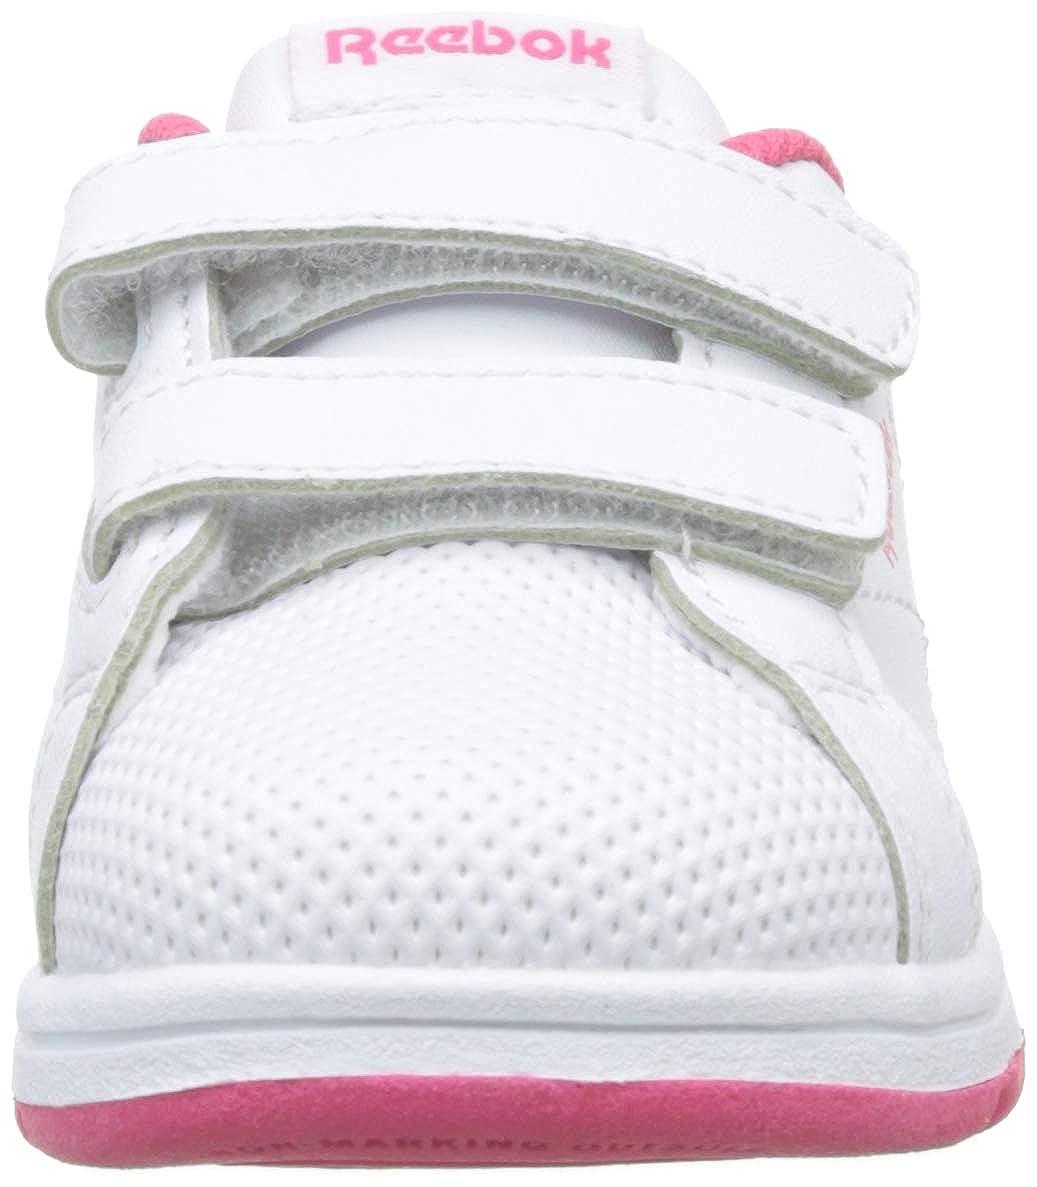 Reebok Baby Girls/' Royal Comp CLN 2v Low-Top Sneakers